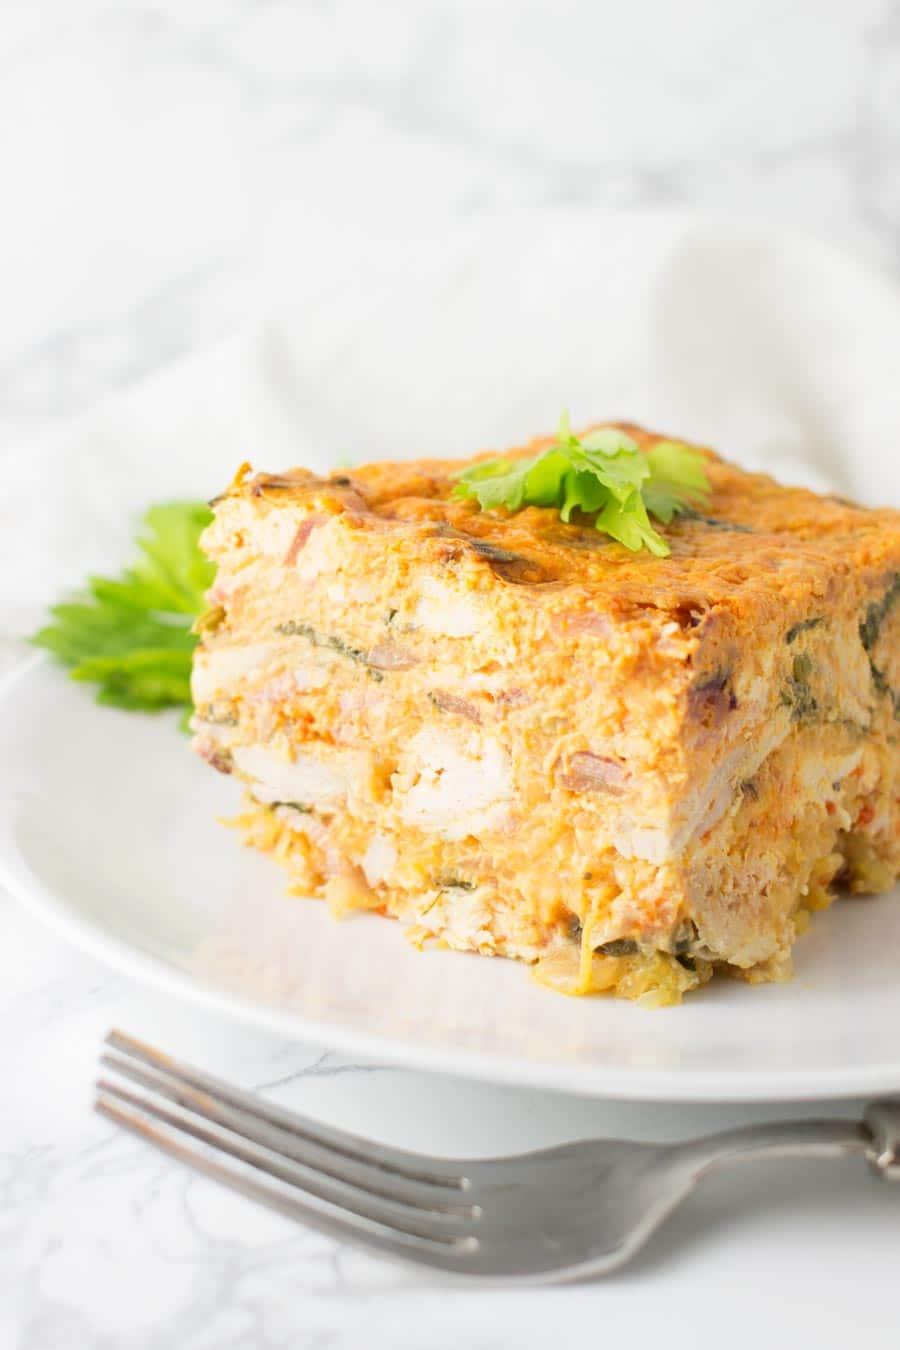 BBQ Chicken Casserole recipe from acleanplate.com #aip #paleo #autoimmuneprotocol